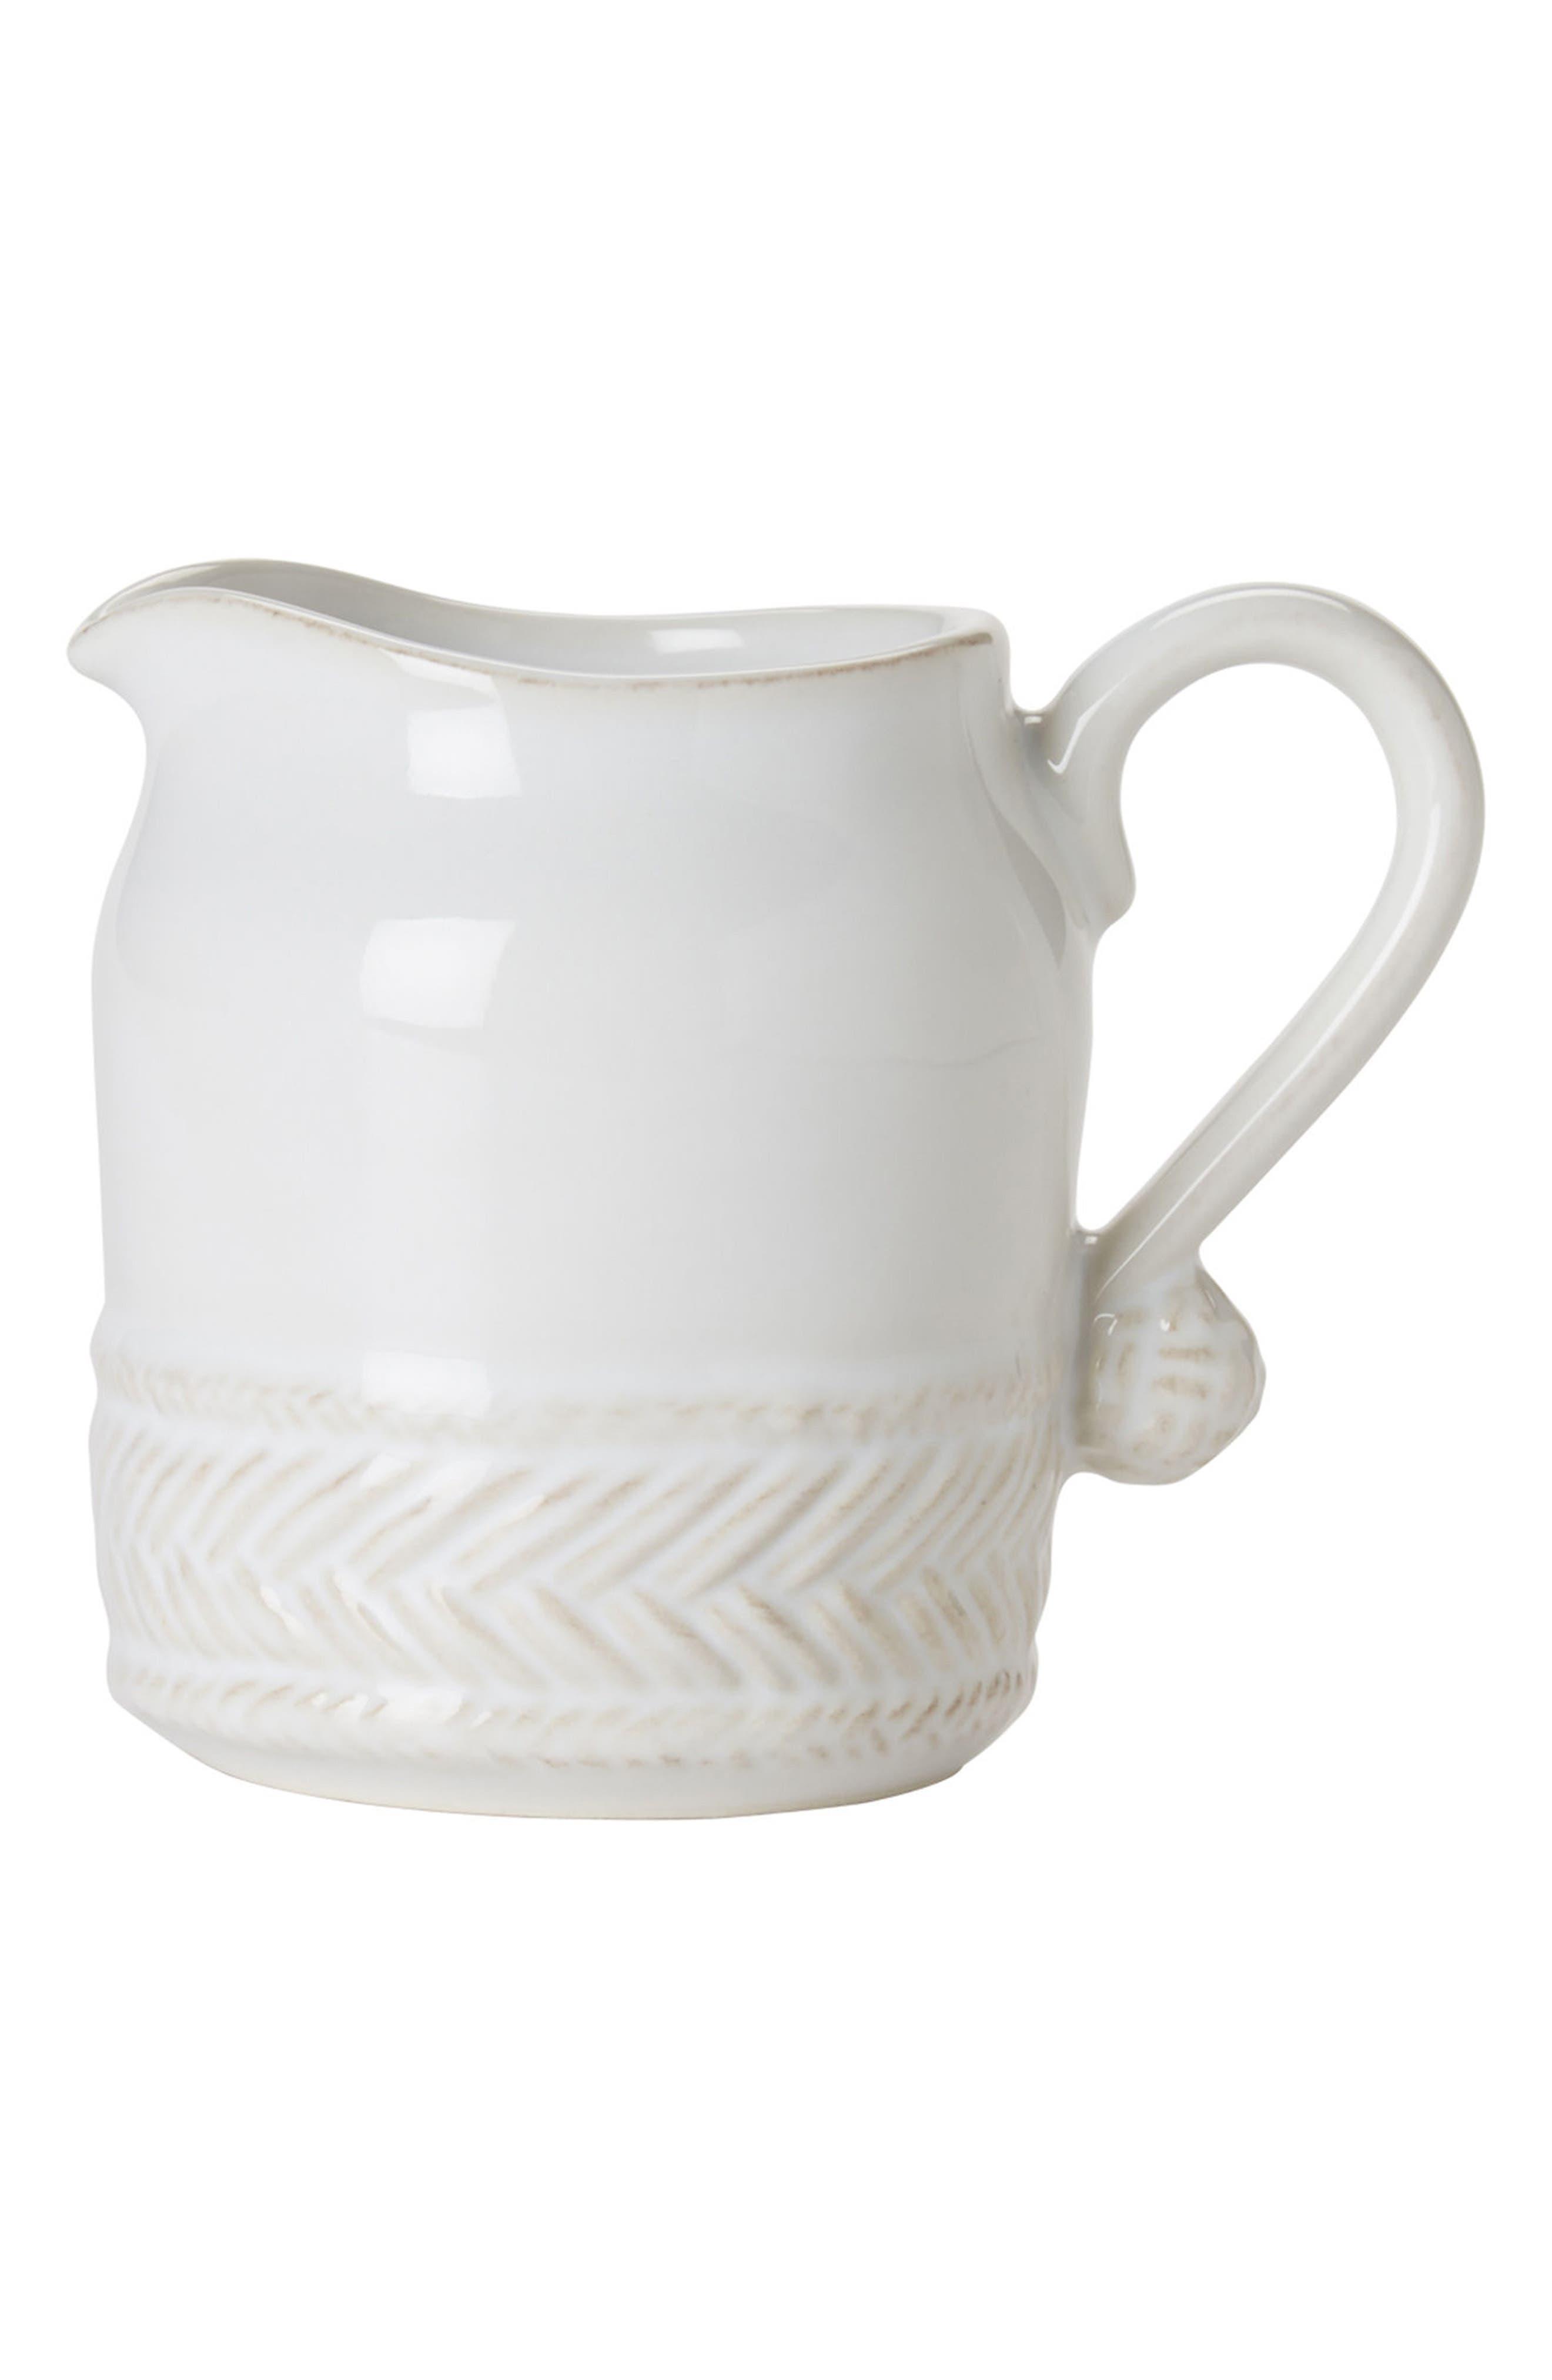 Main Image - Juliska Le Panier Ceramic Creamer